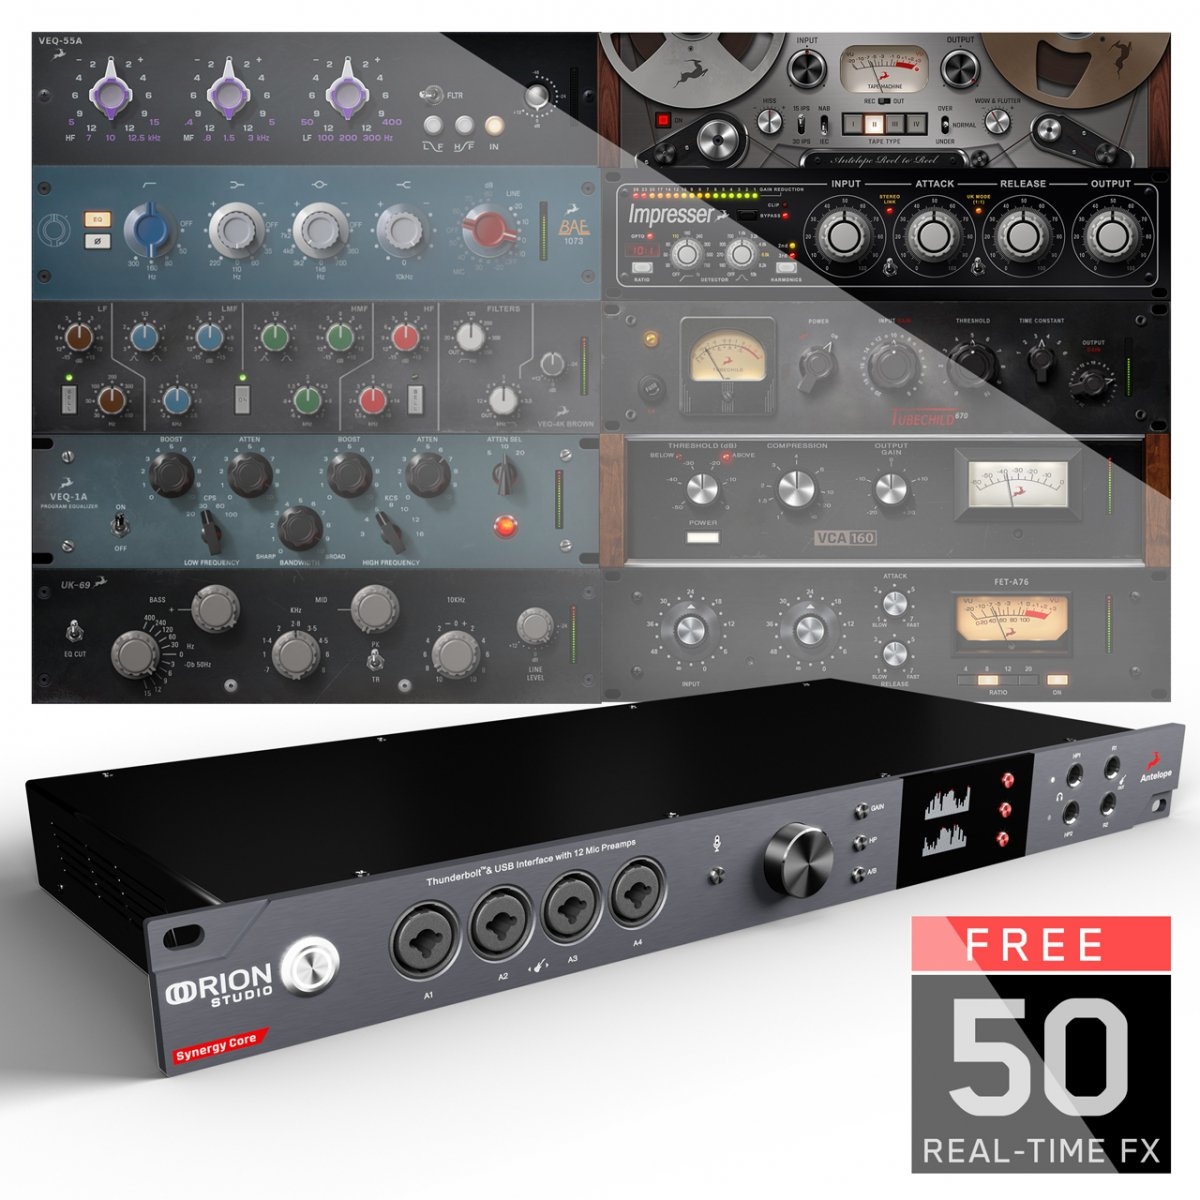 【6 x DSP + 2 x FPGAによる驚くべきサウンド、パワー! 】Antelope Audio Orion Studio Synergy Core